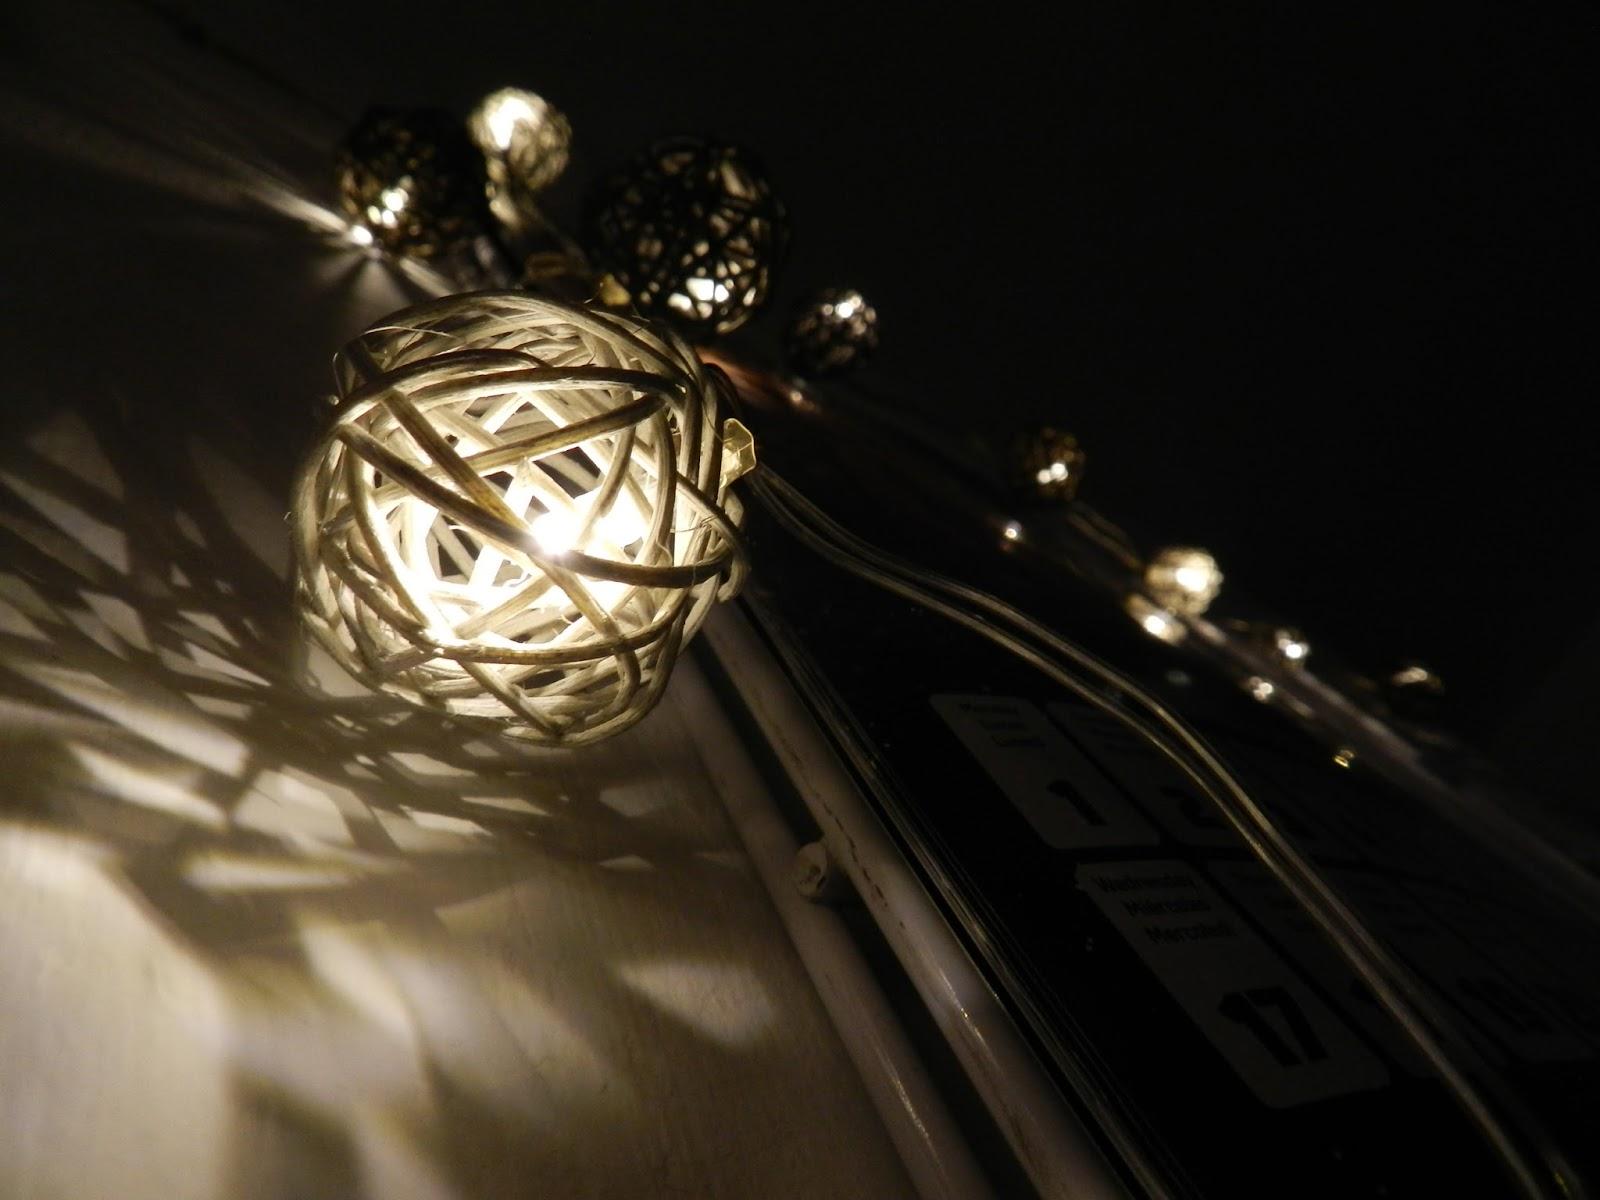 Oh my ribbon sigo decorando - Luces led primark ...